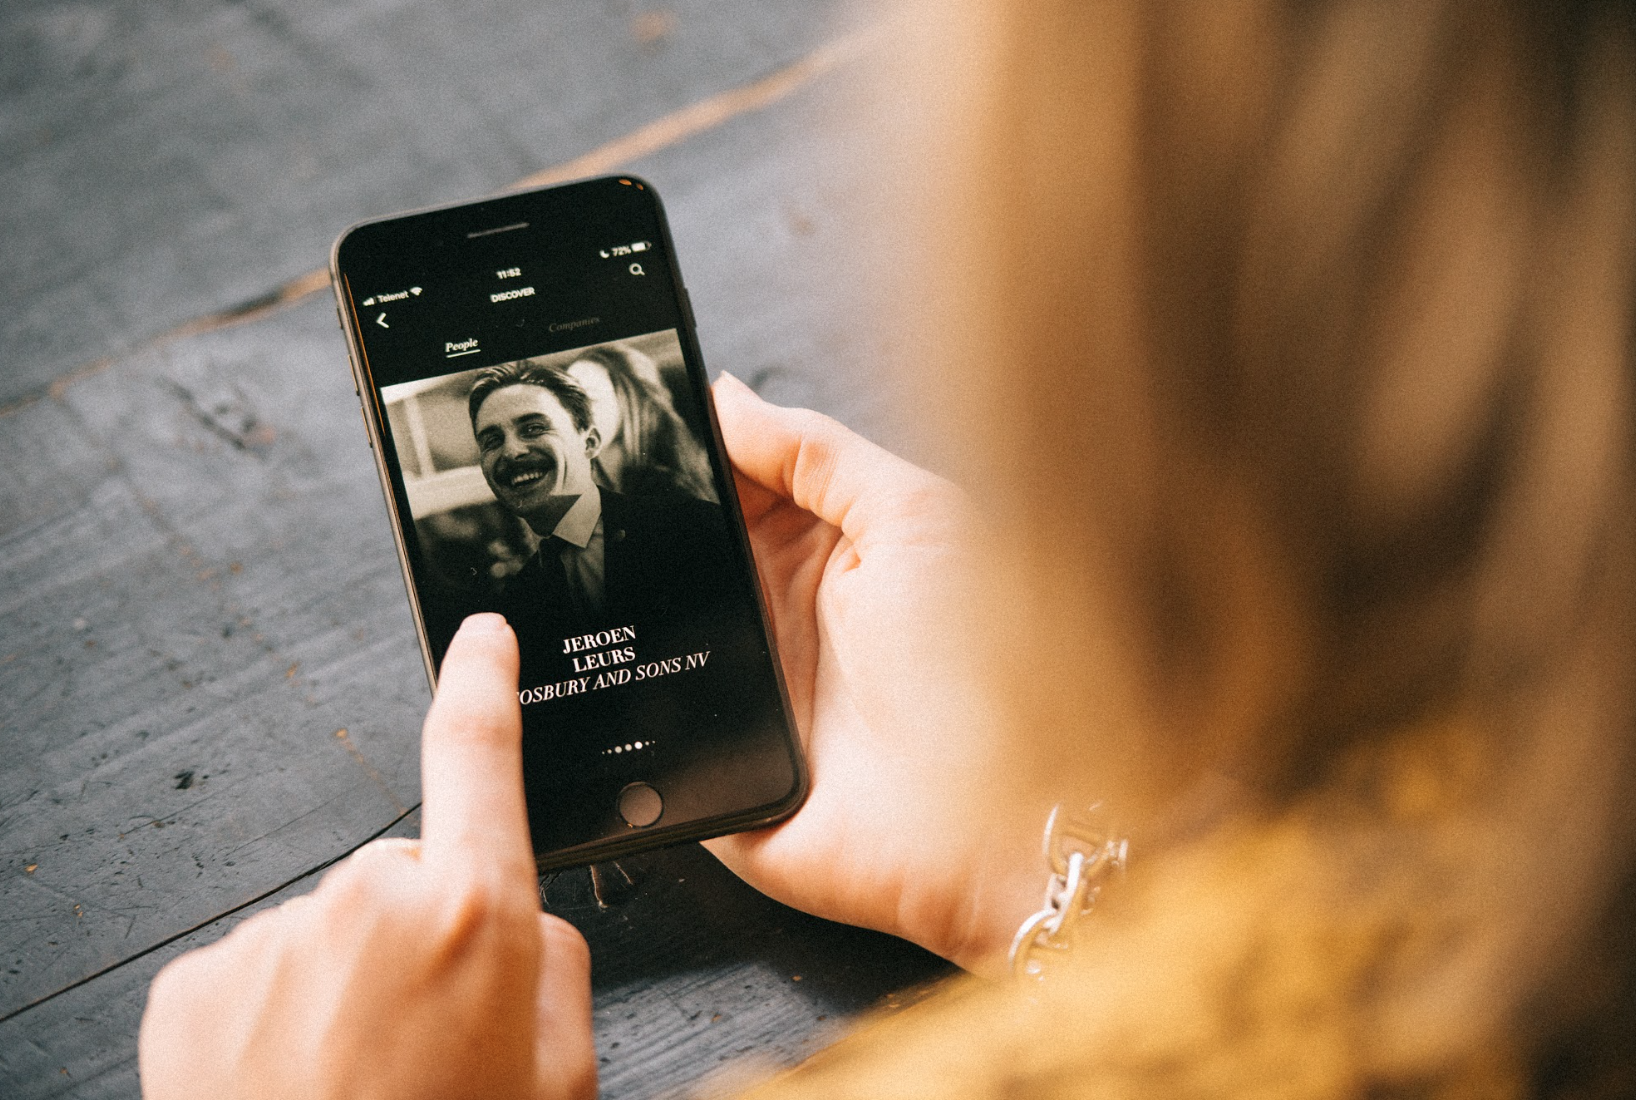 The Fons Jr. app interface. Photography by Jeroen Leurs.